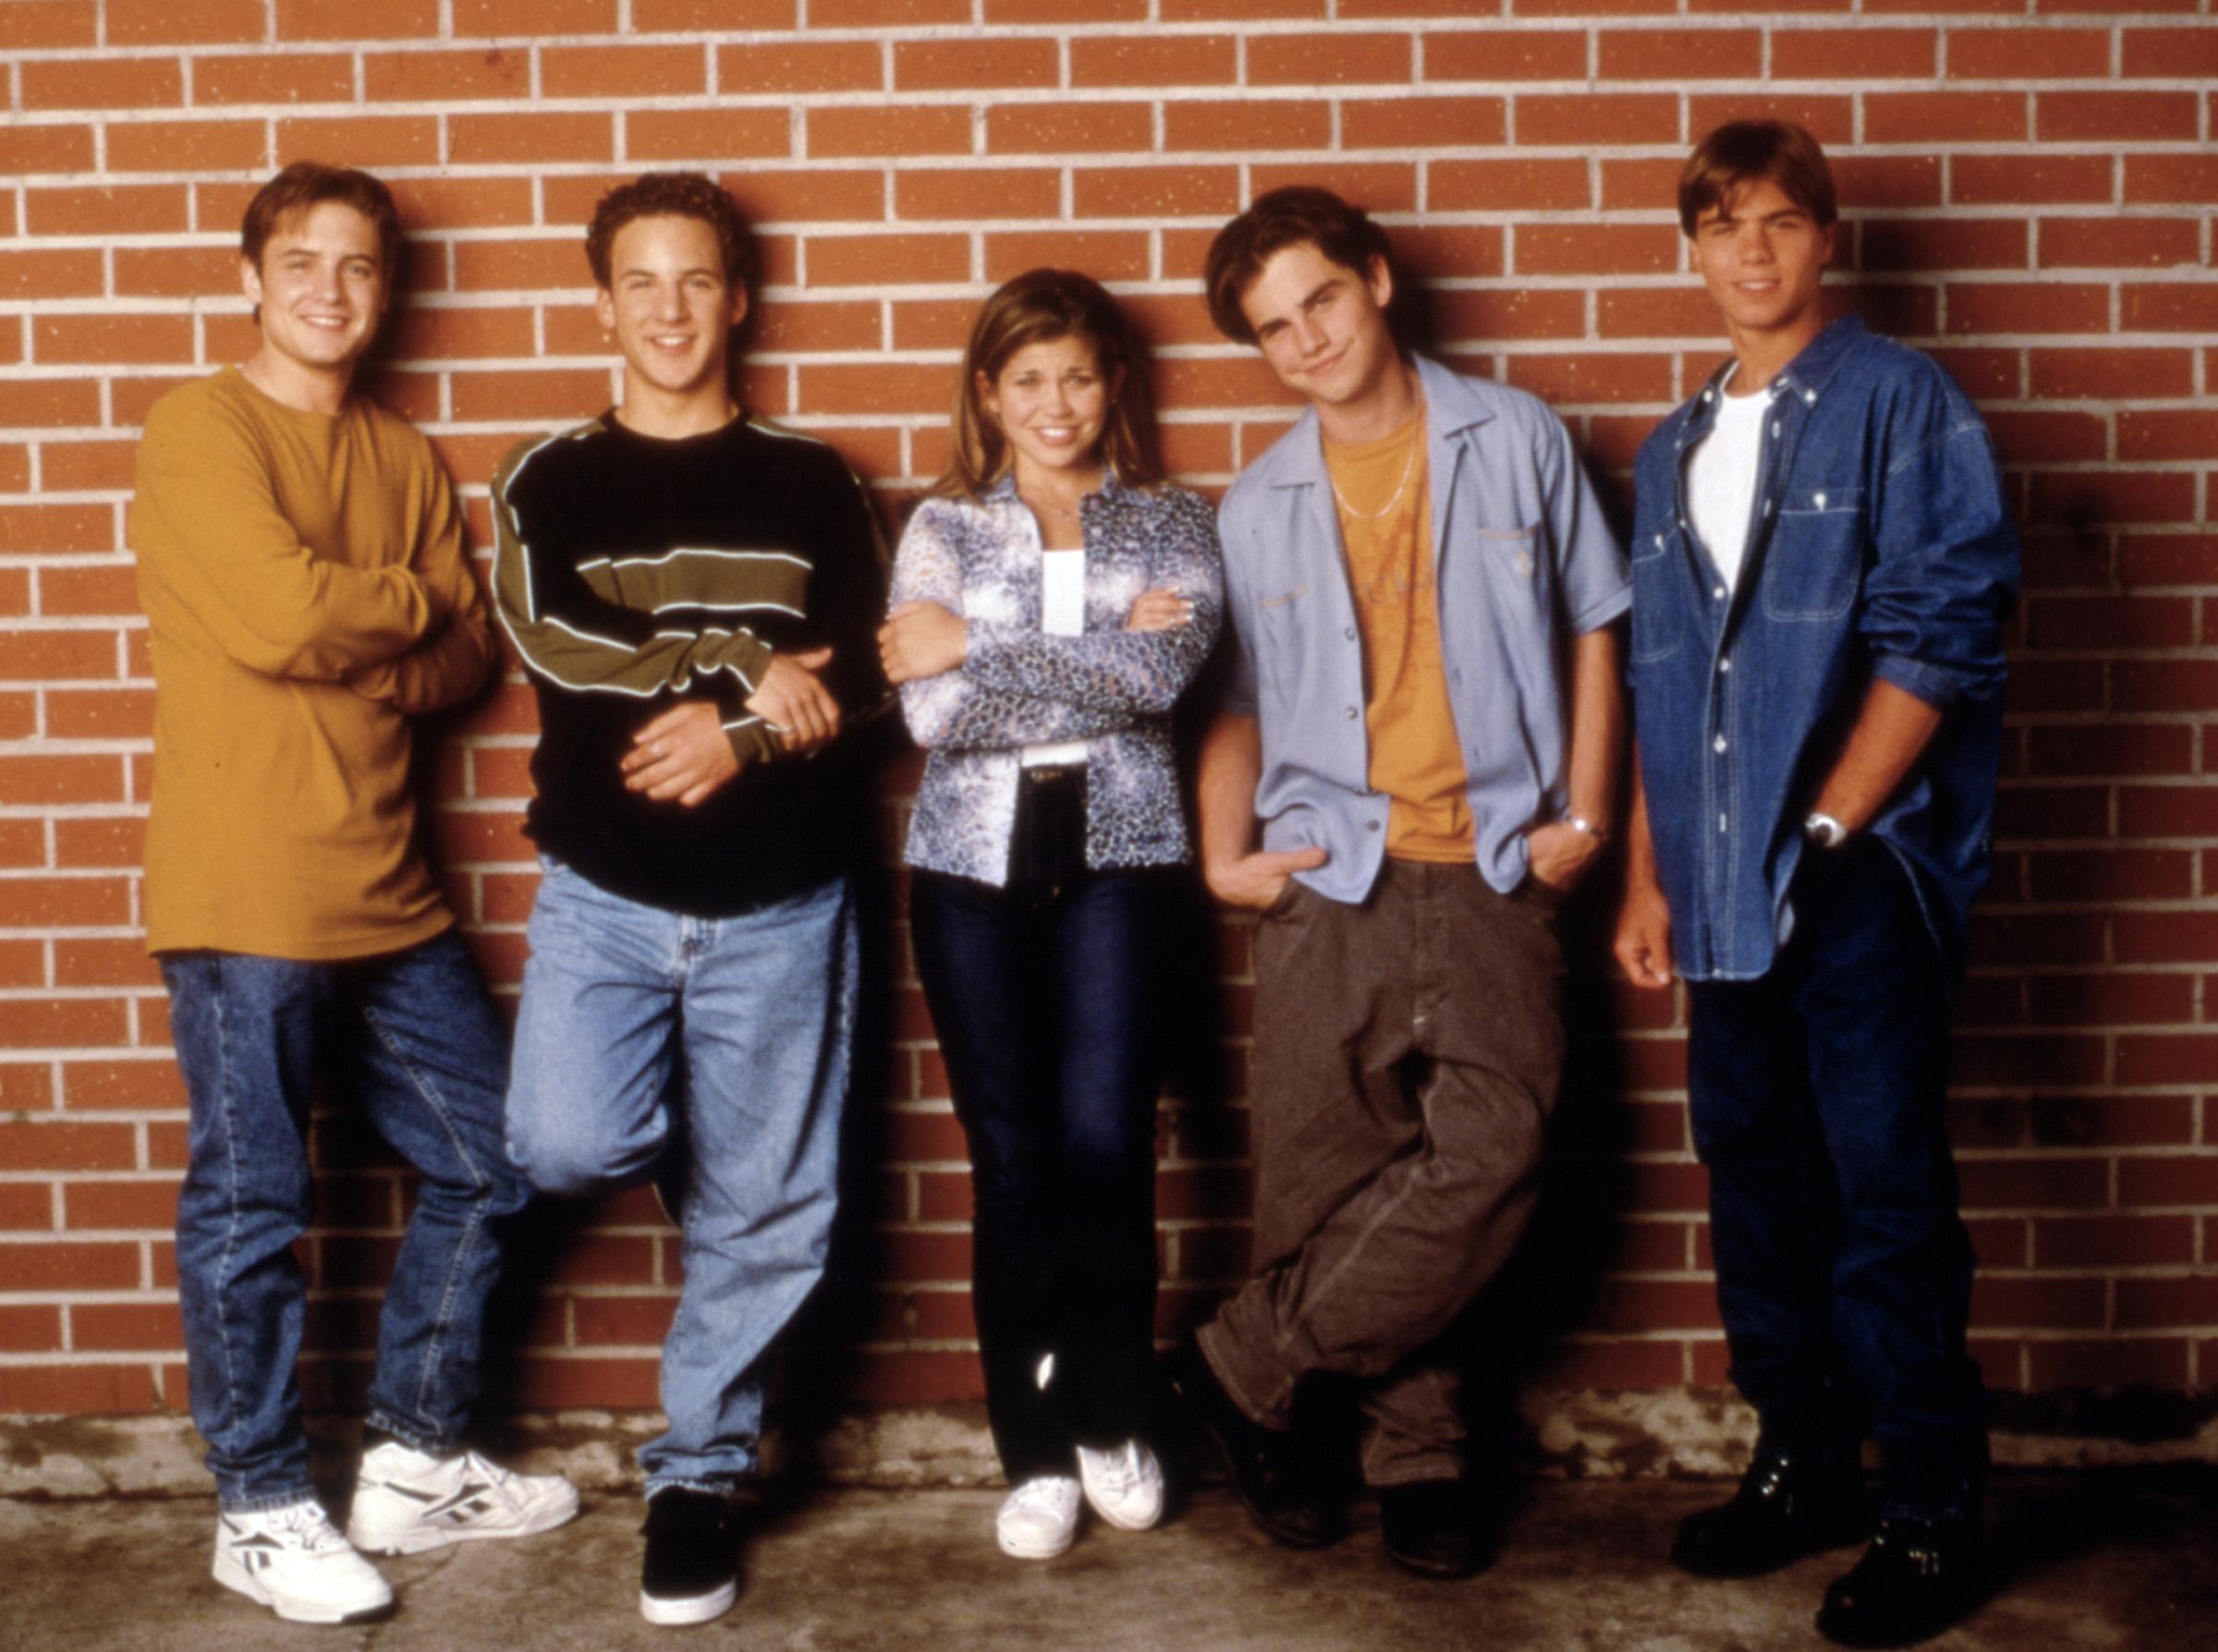 GARÇON RENCONTRE LE MONDE, Will Friedle, Ben Savage, Danielle Fishel, Rider Strong, Matthew Lawrence (1997-2000).  1993-2000.  (c) Buena Vista Television / Courtoisie: Everett Collection.